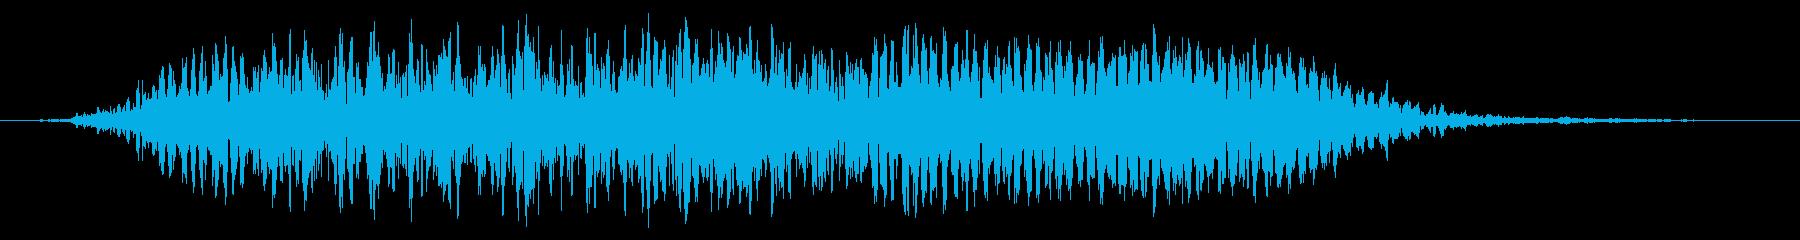 UNDEAD GROANヴァンパイ...の再生済みの波形